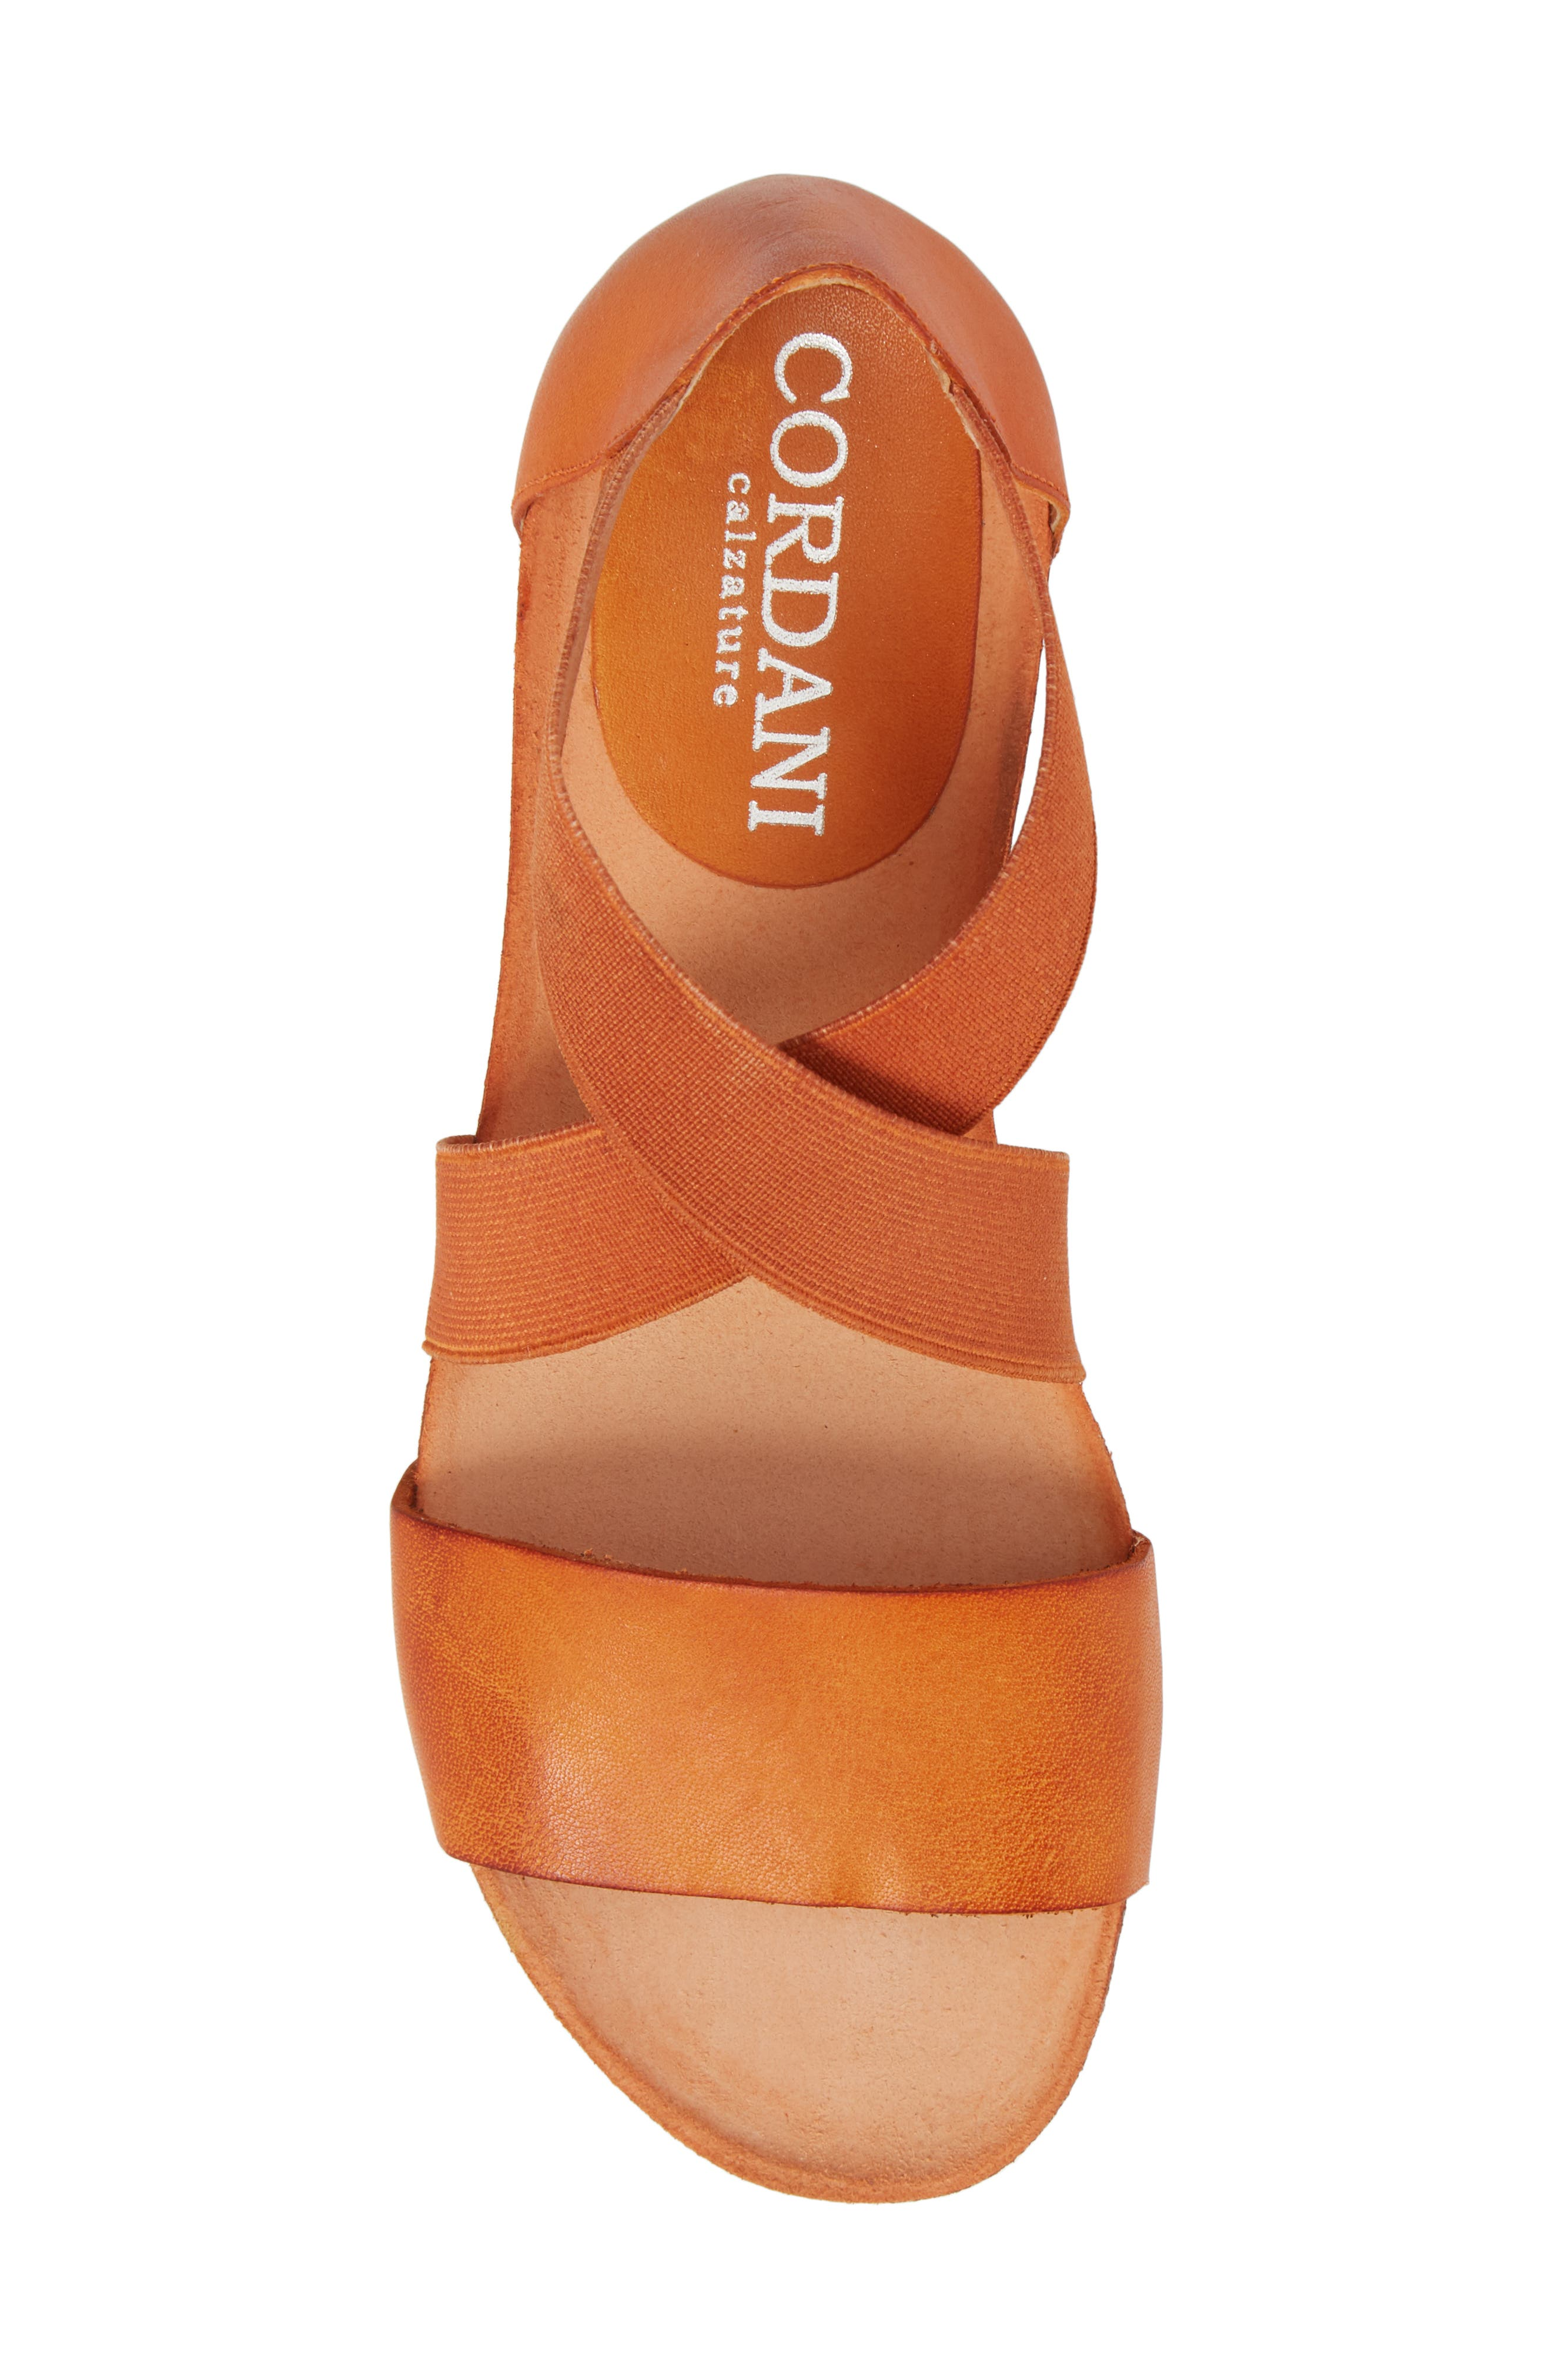 Sayger Sandal,                             Alternate thumbnail 5, color,                             Orange Leather